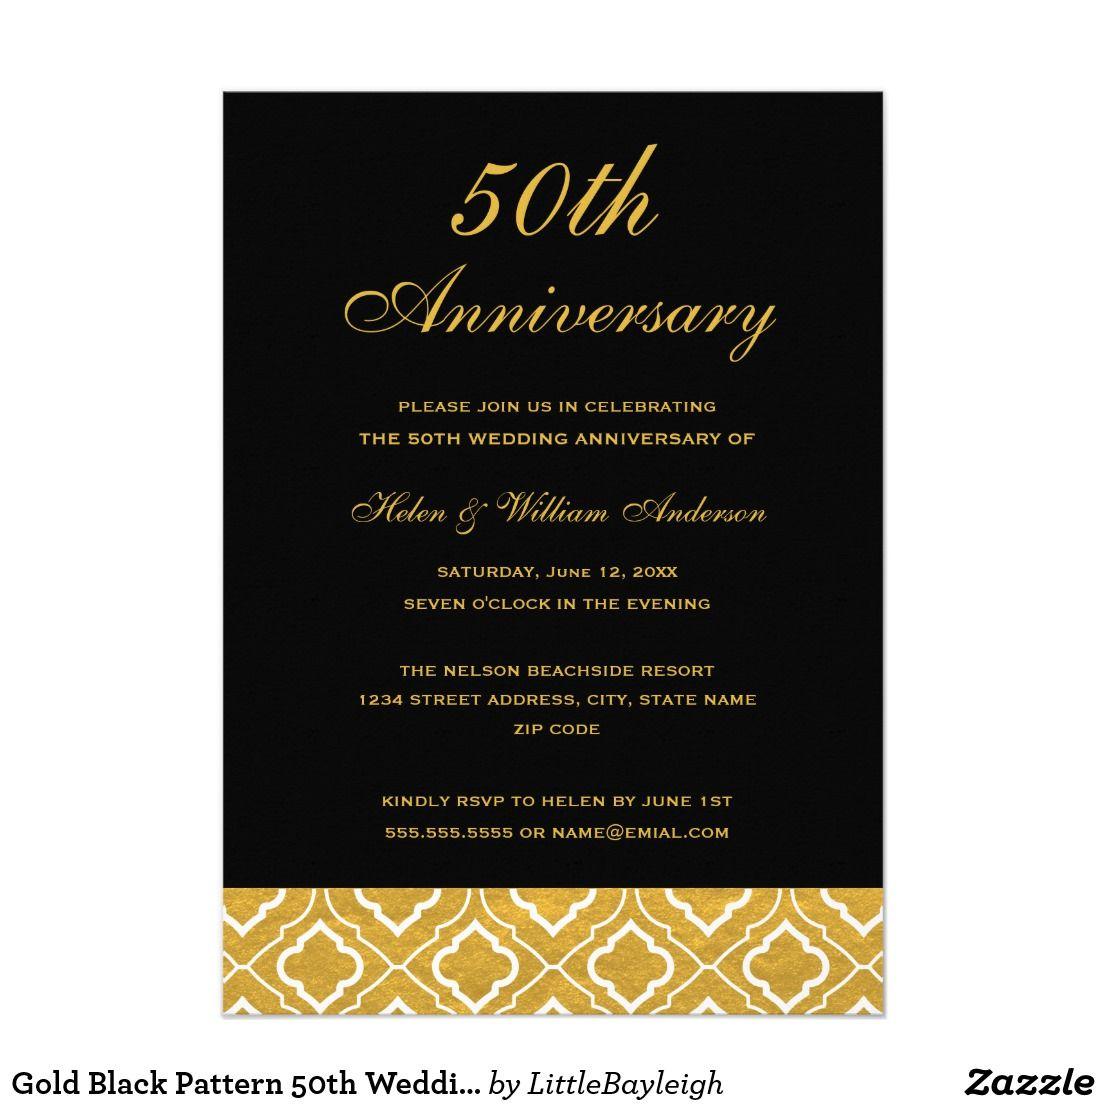 Gold Black Pattern 50th Wedding Anniversary Card Anniversary